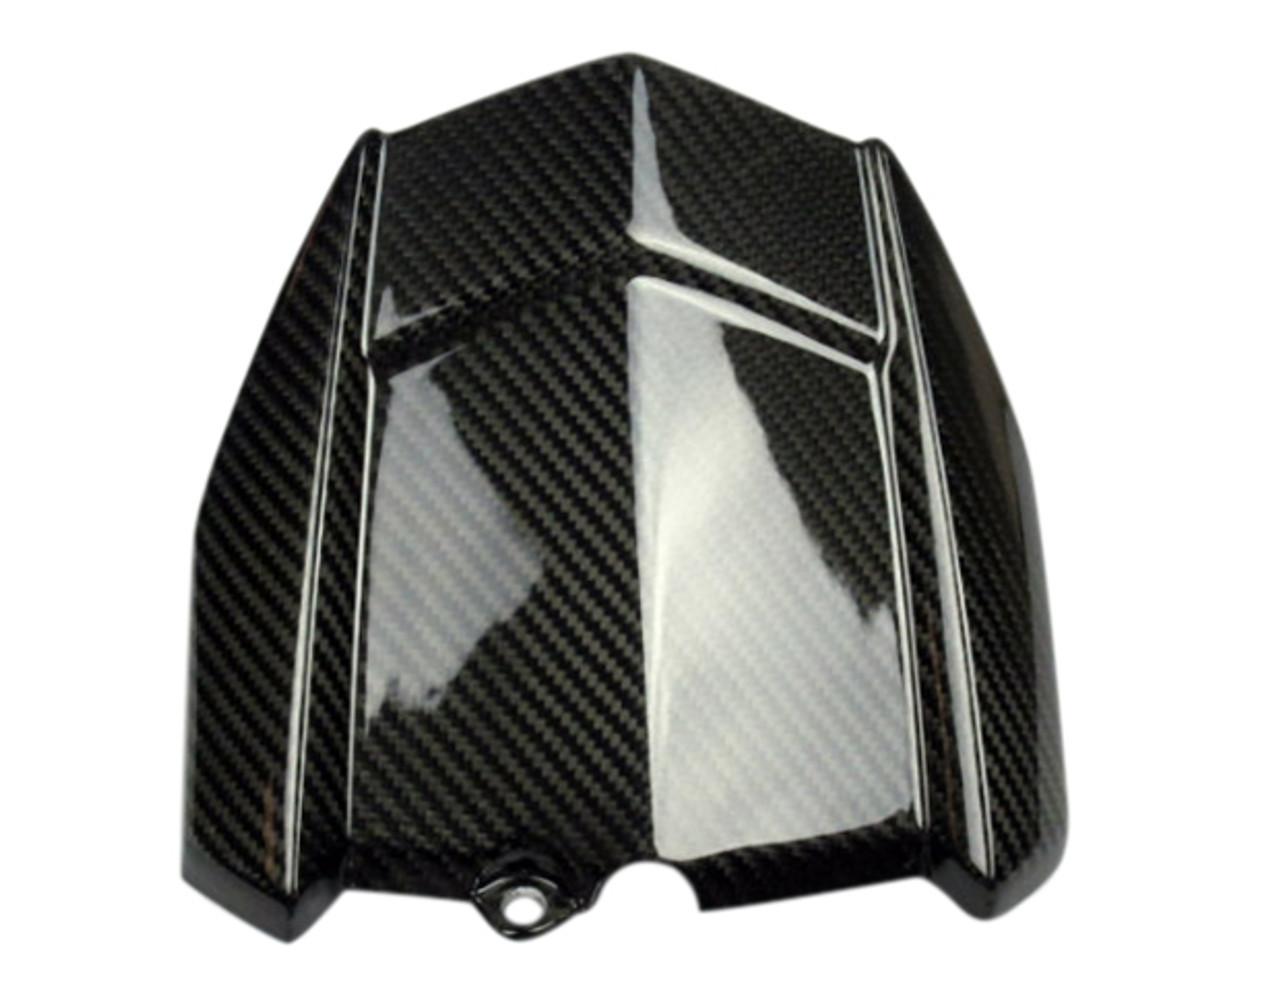 Rear Hugger in Glossy Twill Weave Carbon Fiber for Yamaha FZ-09/ MT-09 / FJ-09/ XSR900